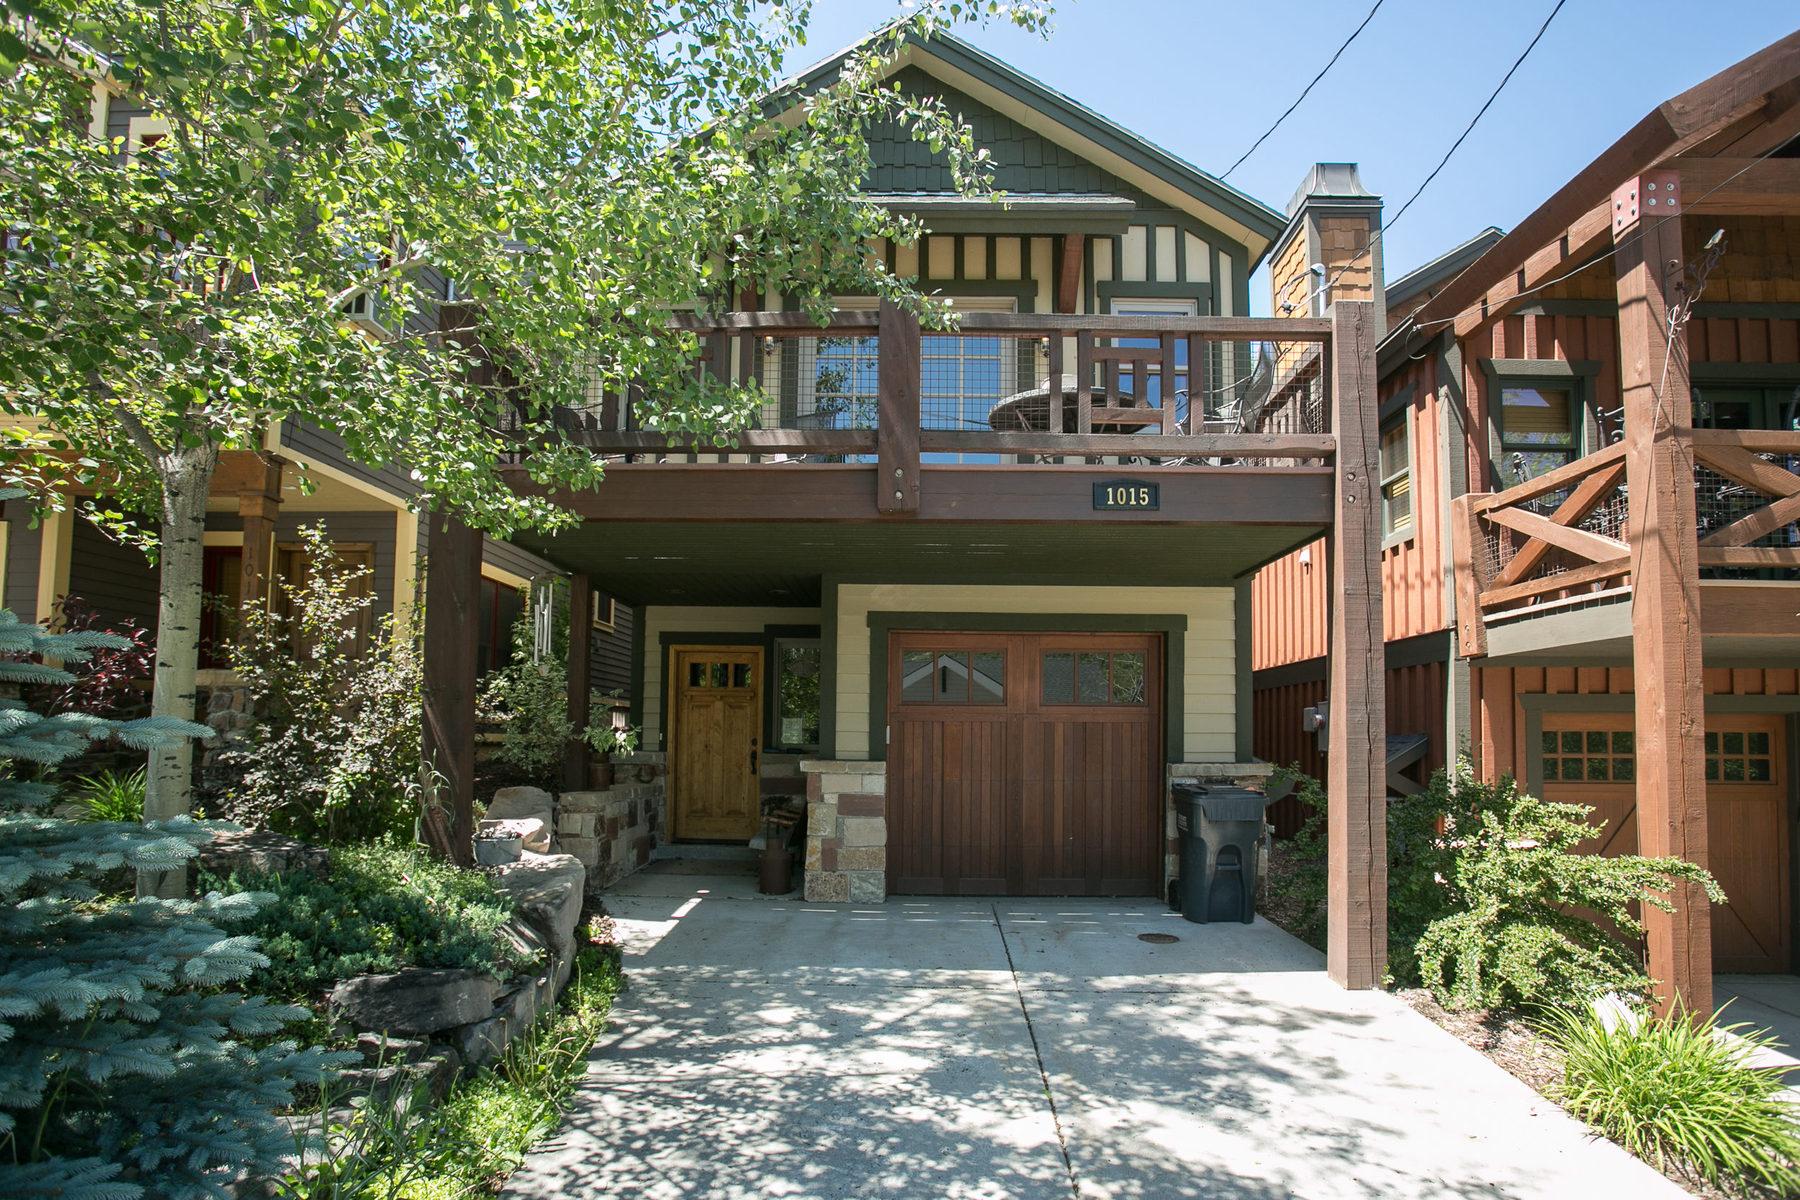 独户住宅 为 销售 在 Fabulous Old Town Custom Home 1015 Norfolk Dr Park City, 犹他州 84060 美国